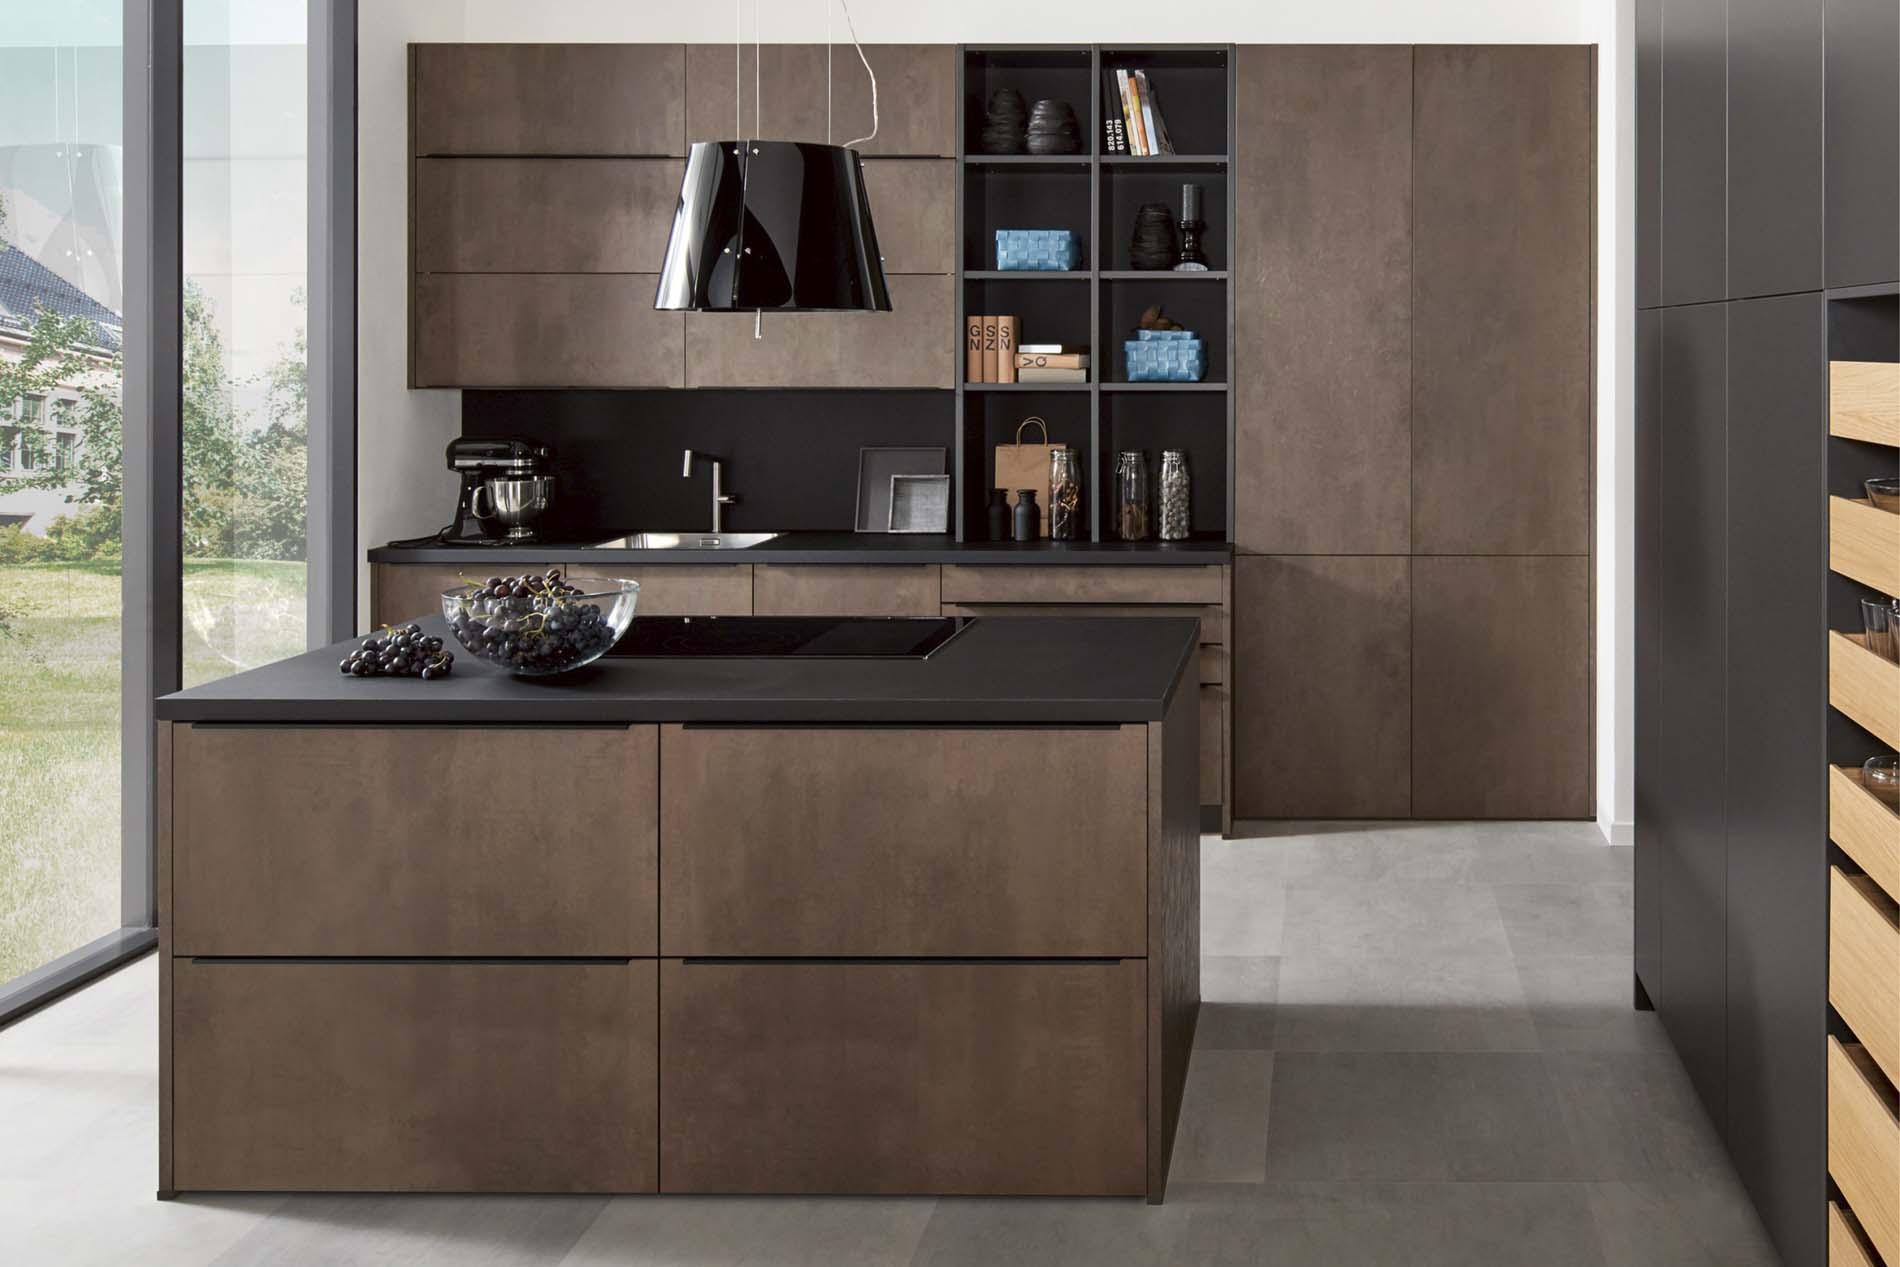 Vierkant keukeneiland in bruine beton look, ASWA Keukens